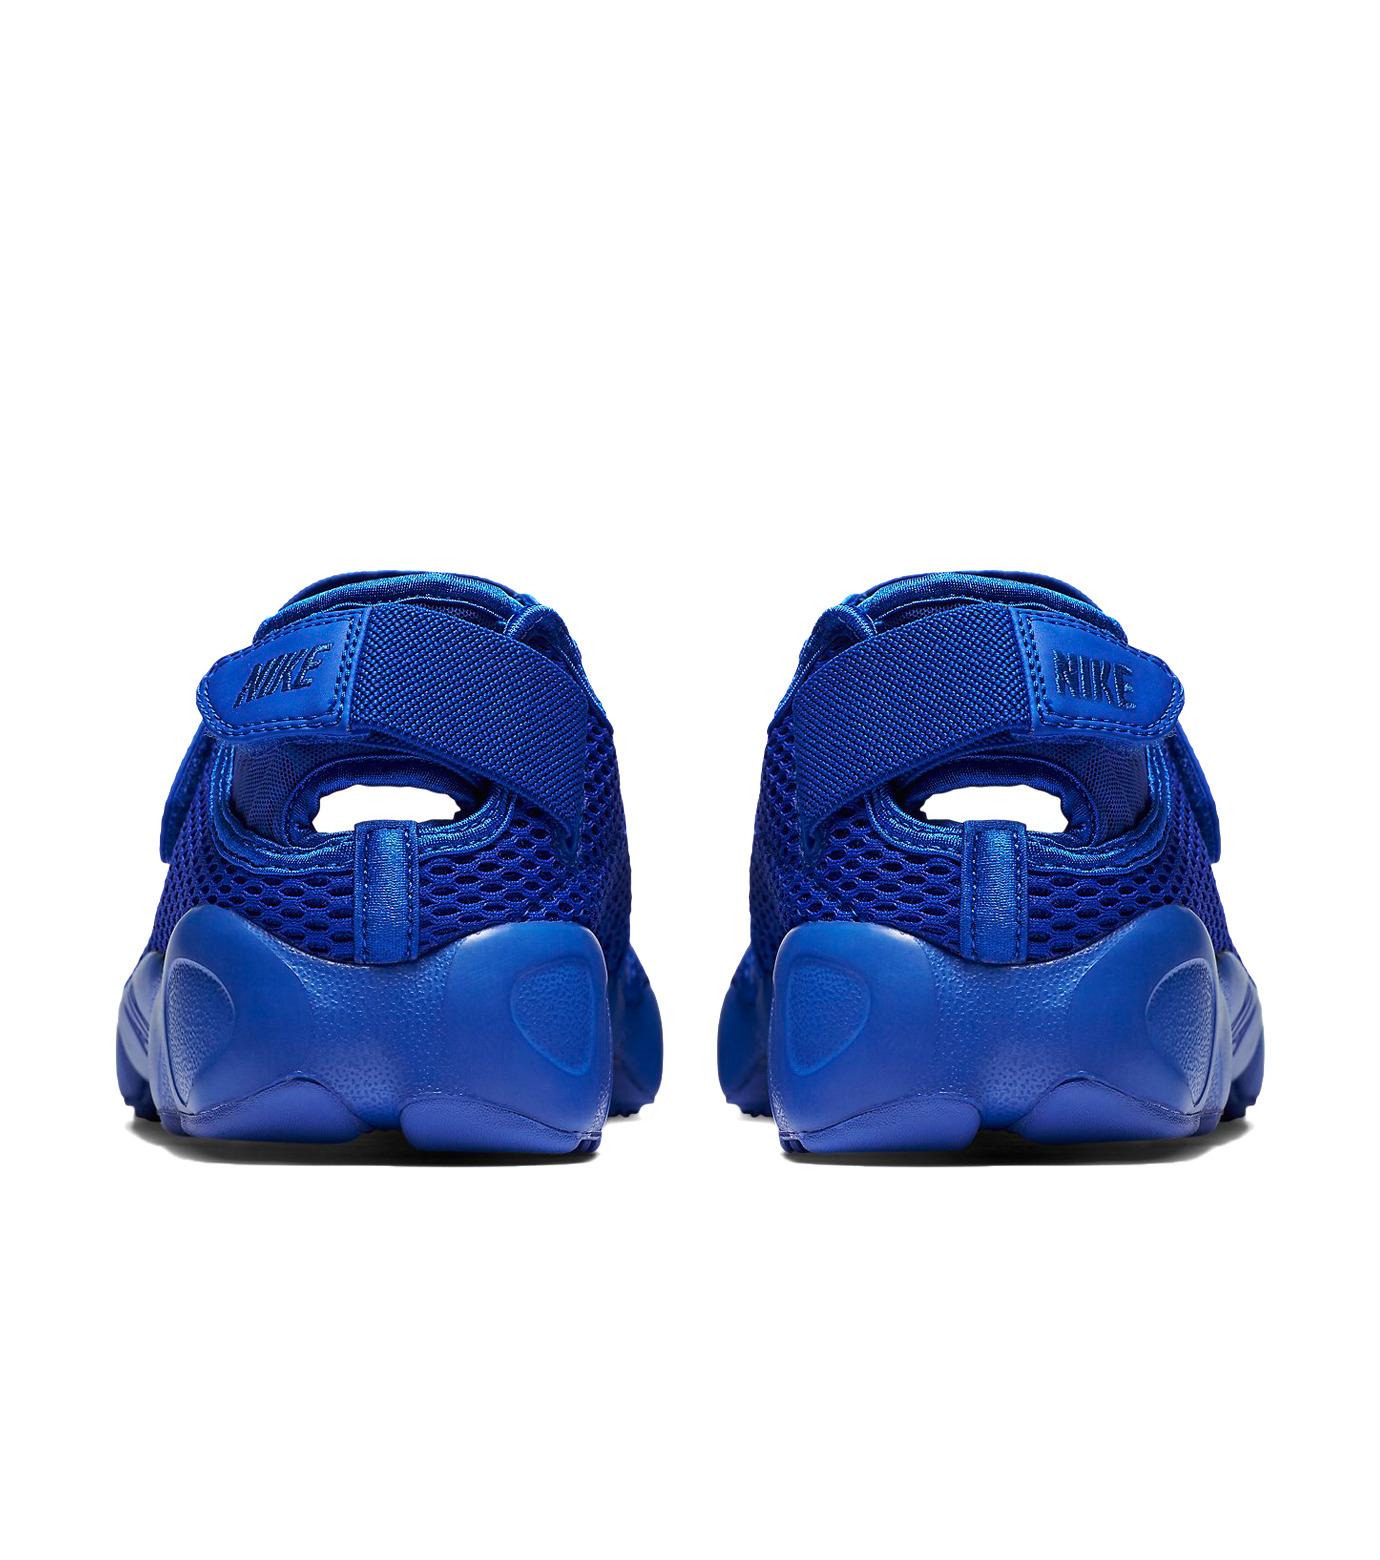 NIKE(ナイキ)のAir Rift Breathe-BLUE(シューズ/shoes)-847609-400-92 拡大詳細画像6